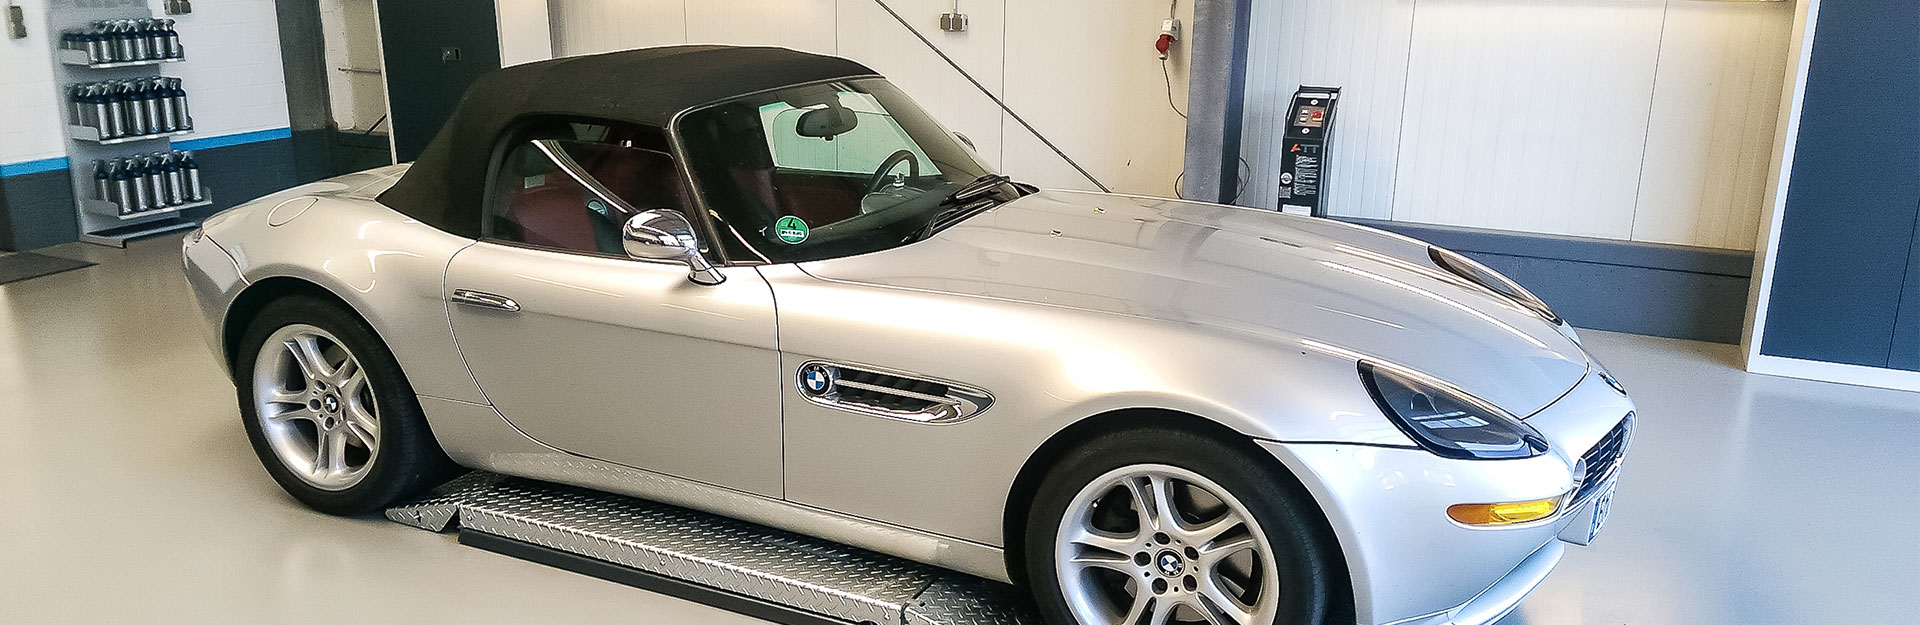 Fahrzeugaufbereitung-Erftstadt-Cleanworx